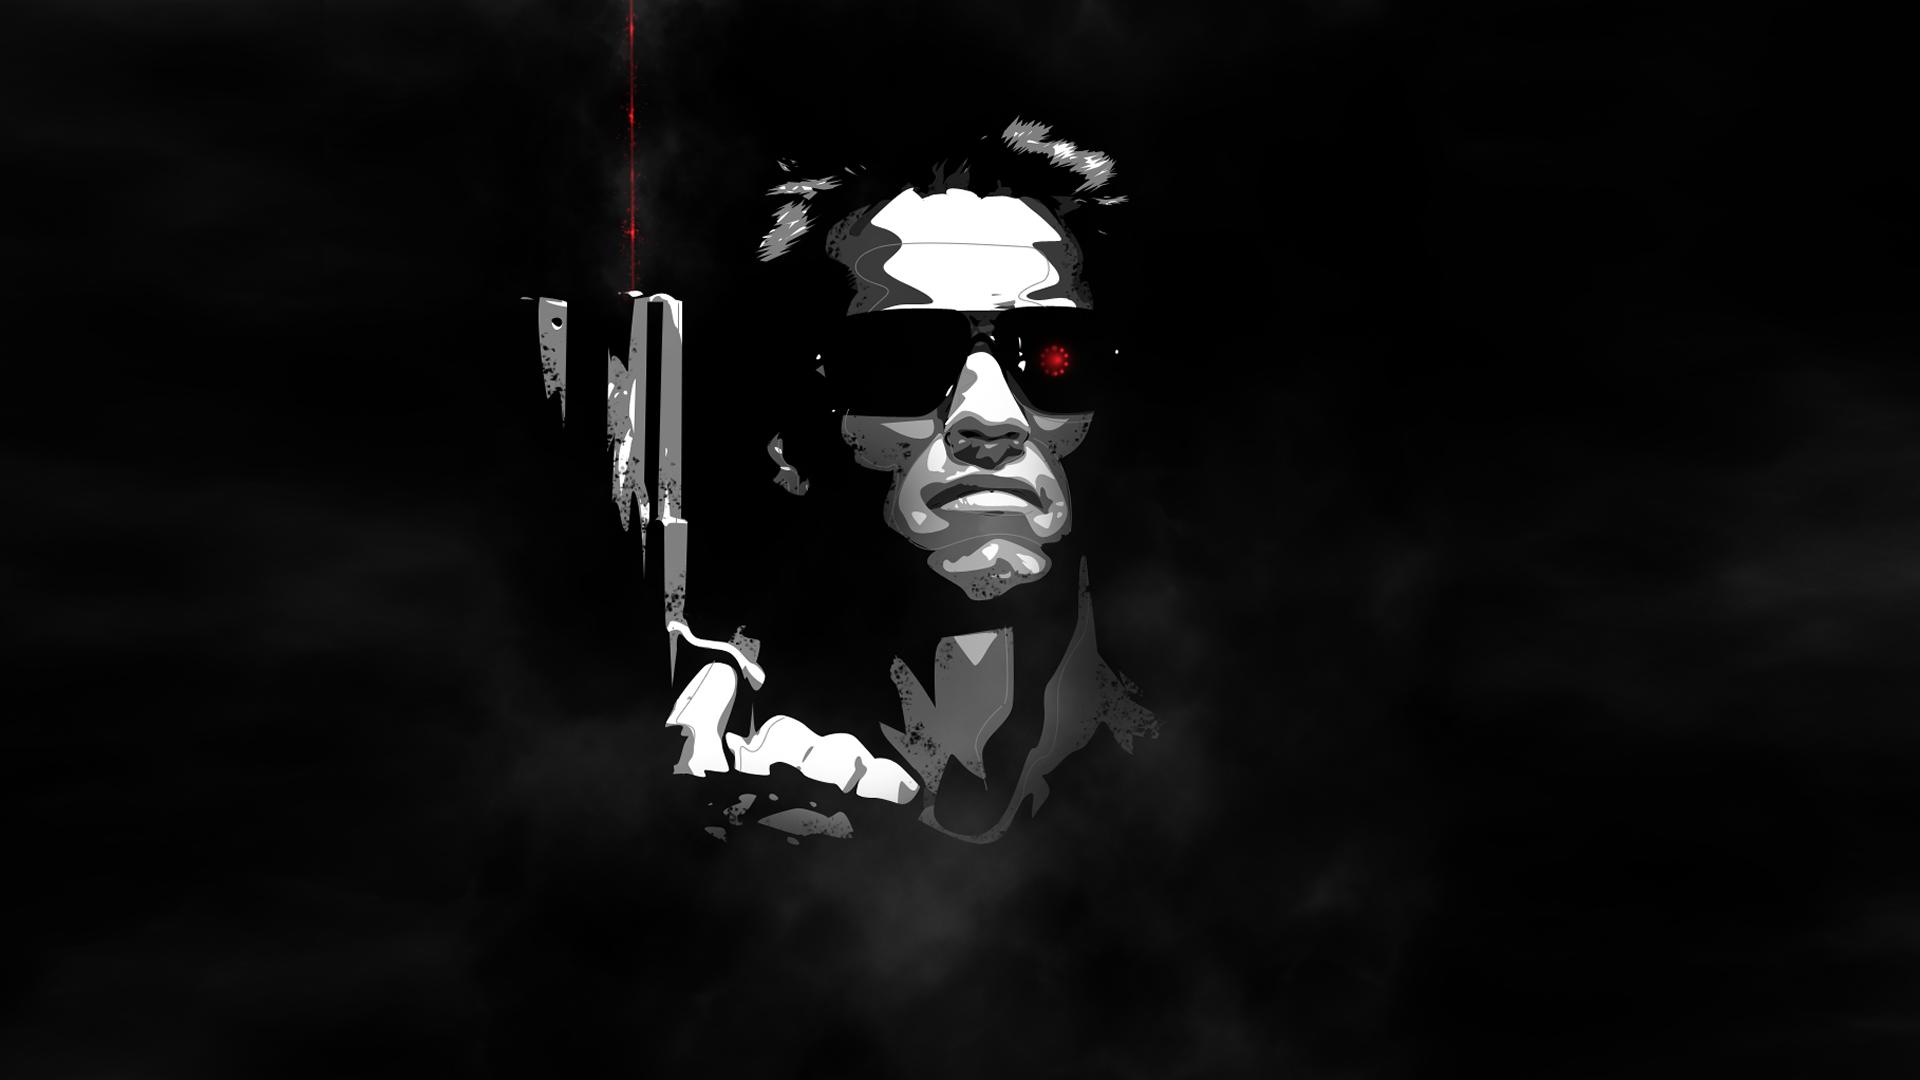 Terminator 1 Wallpaper 1